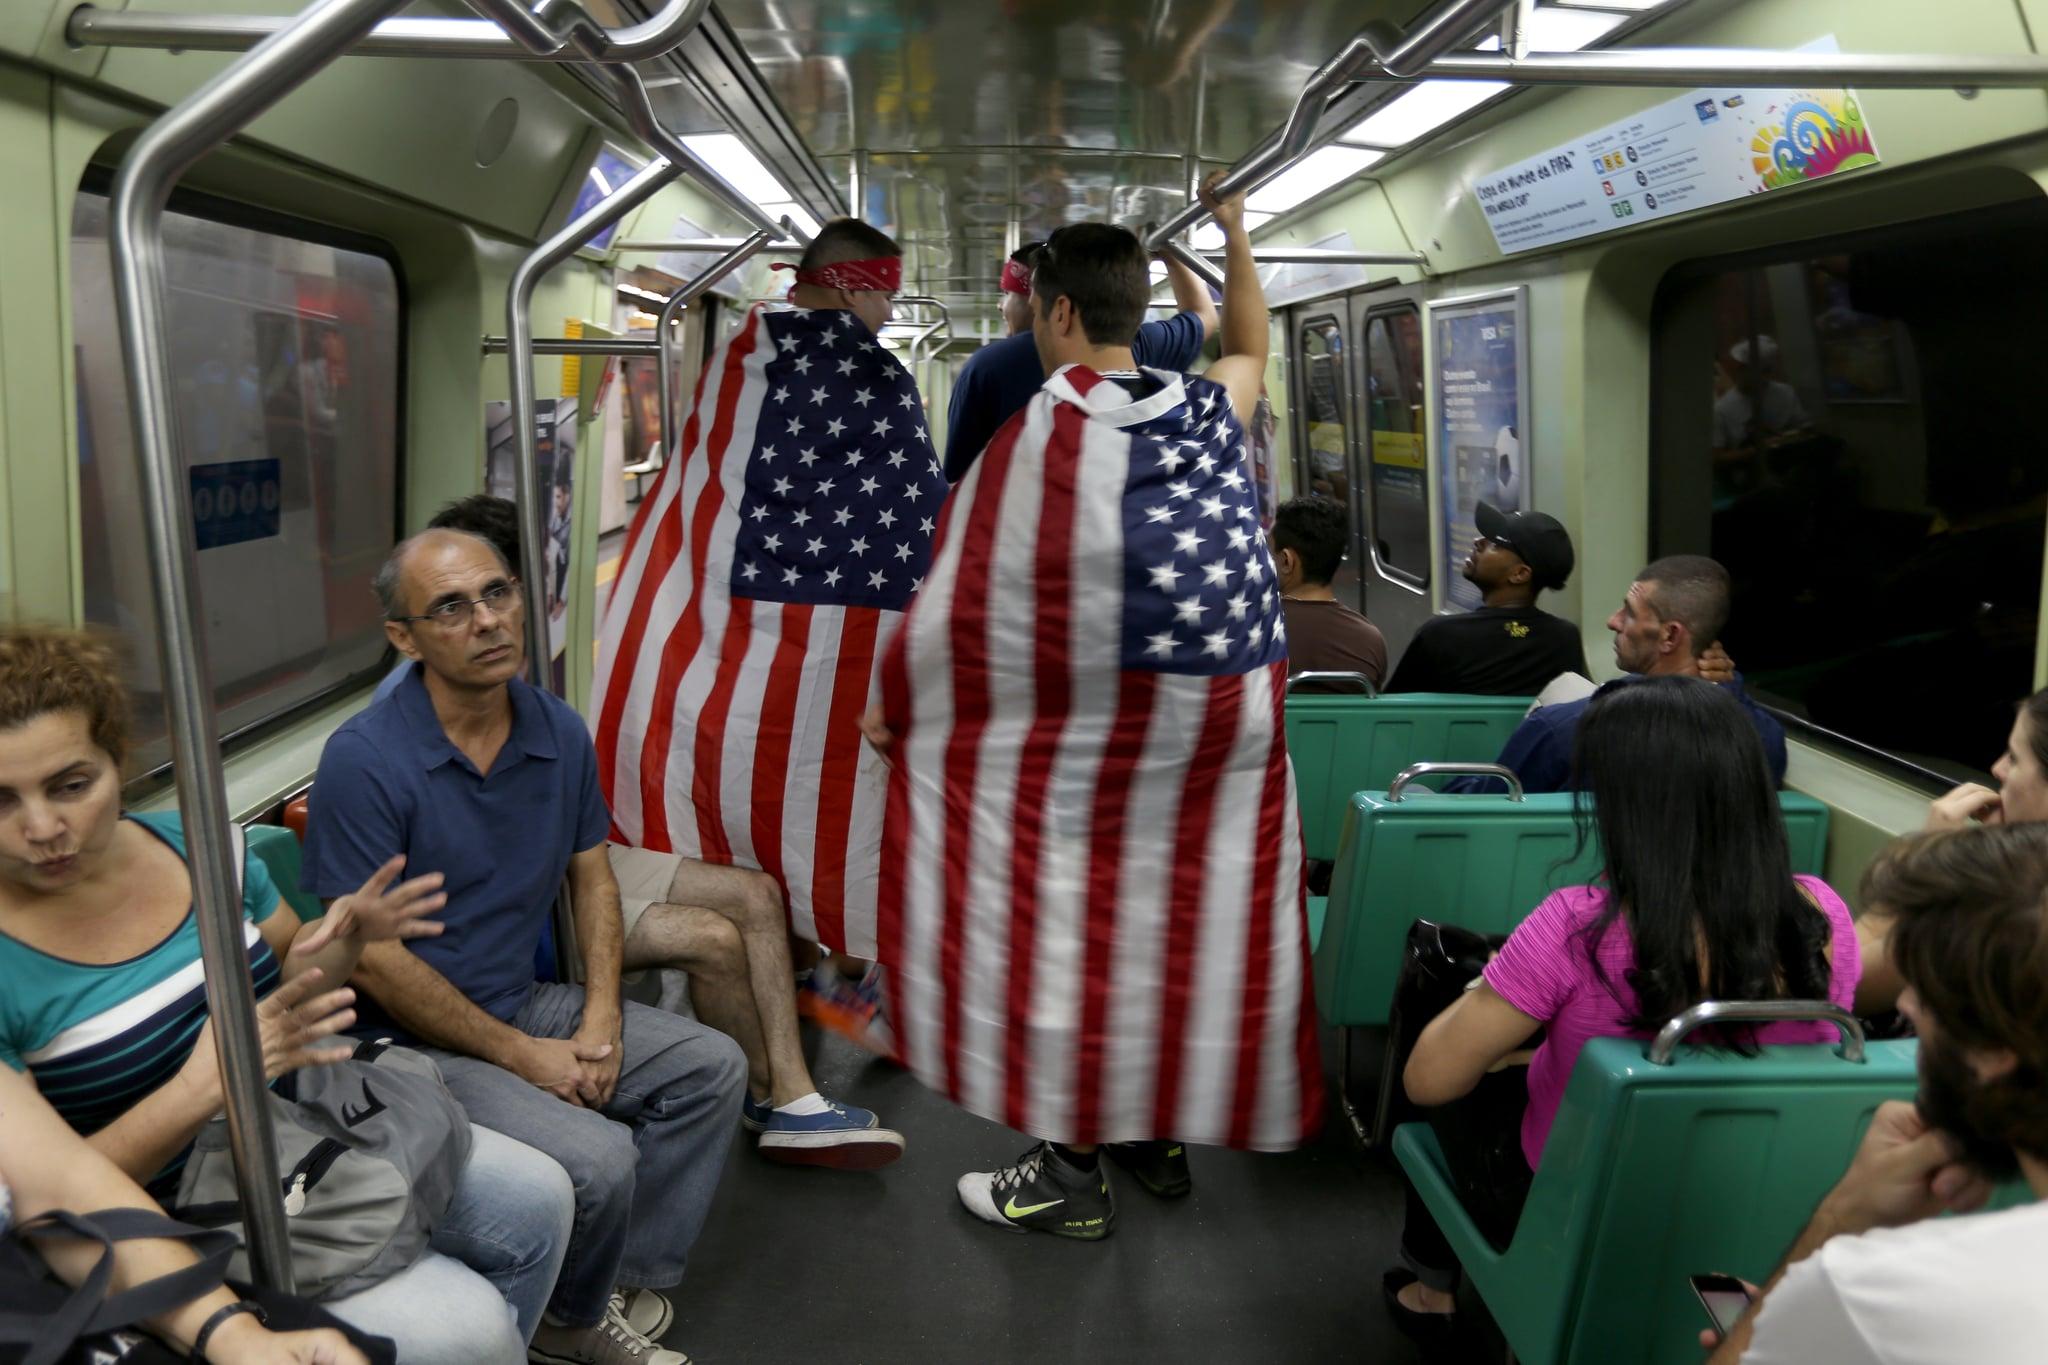 In Rio de Janeiro, Brazil, fans wearing American flags rode the subway.